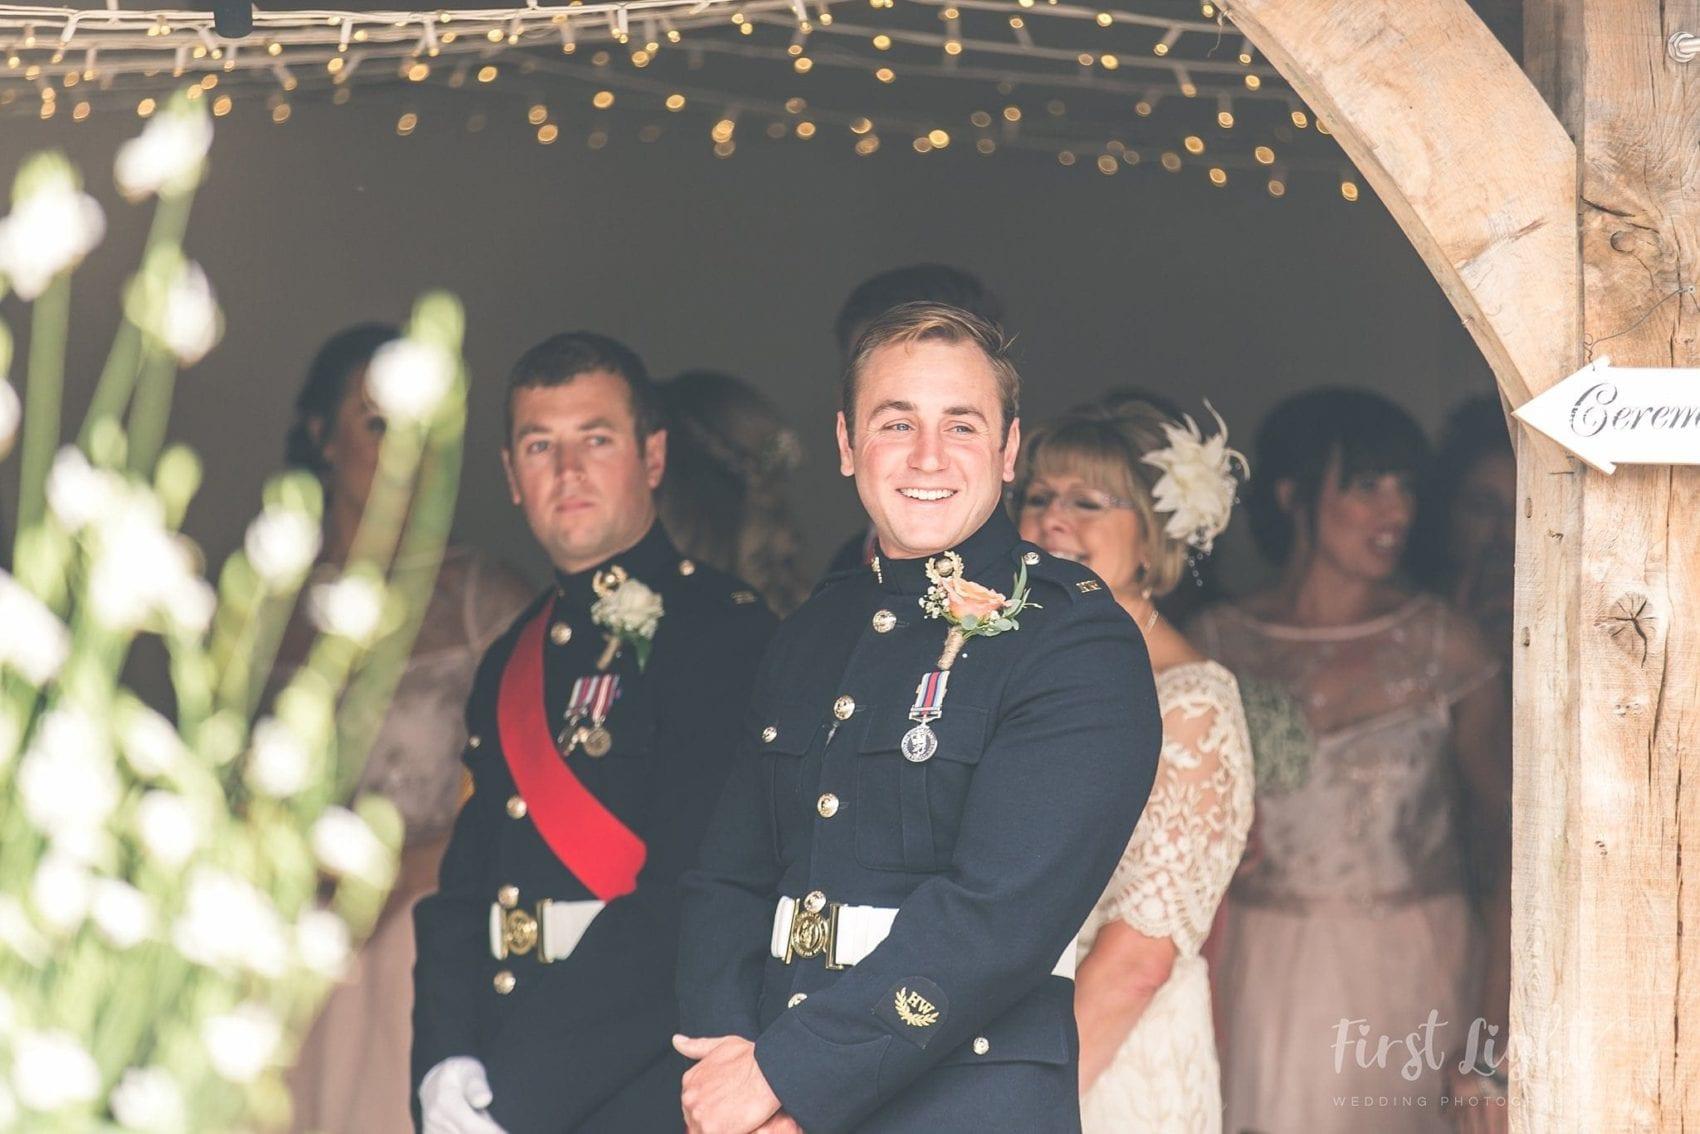 Groom, best man, ceremony, wedding, first light, ever after, wedding barn